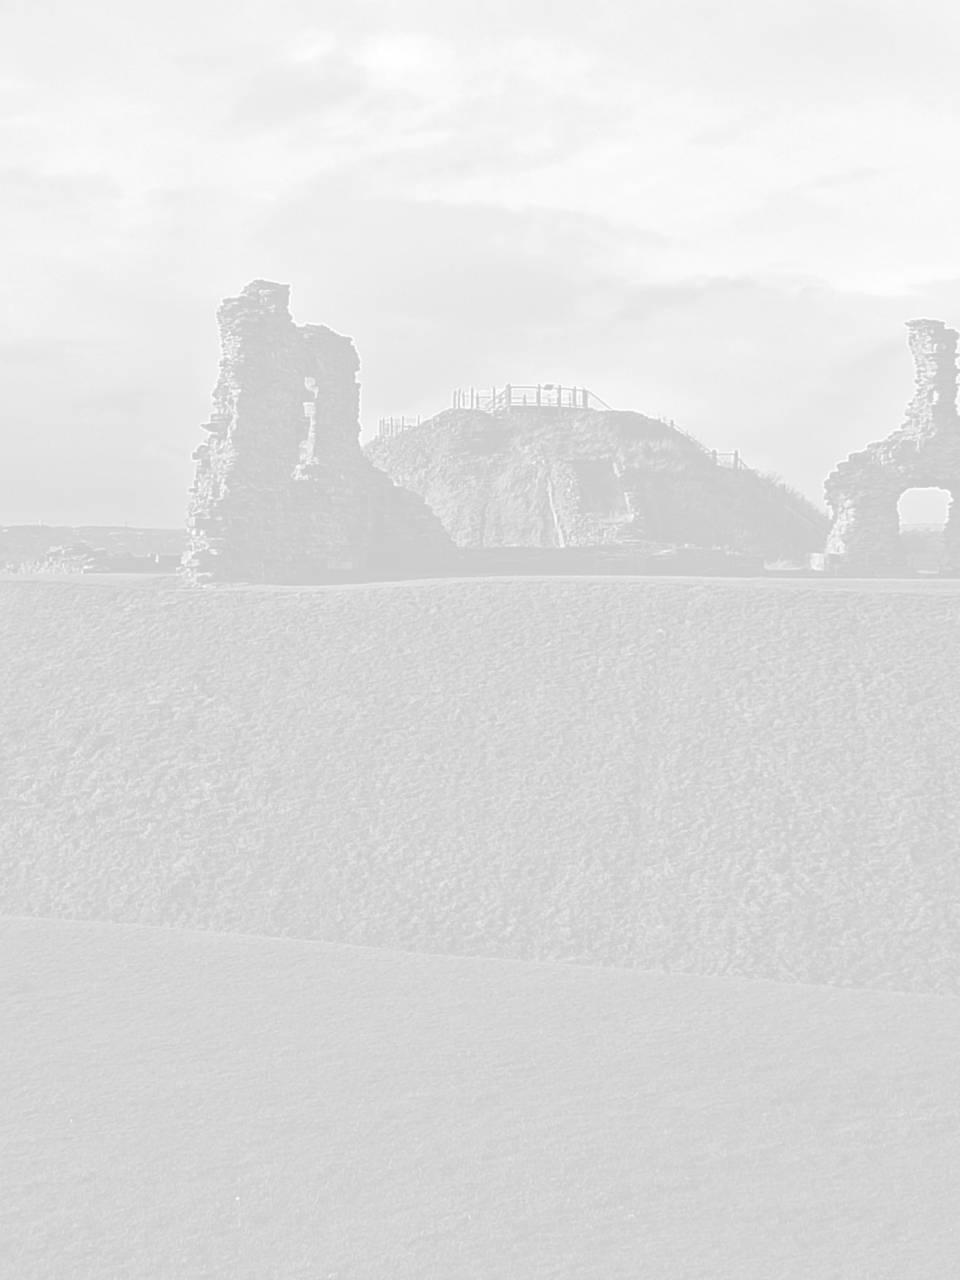 seo company wakefield image of sandal castle